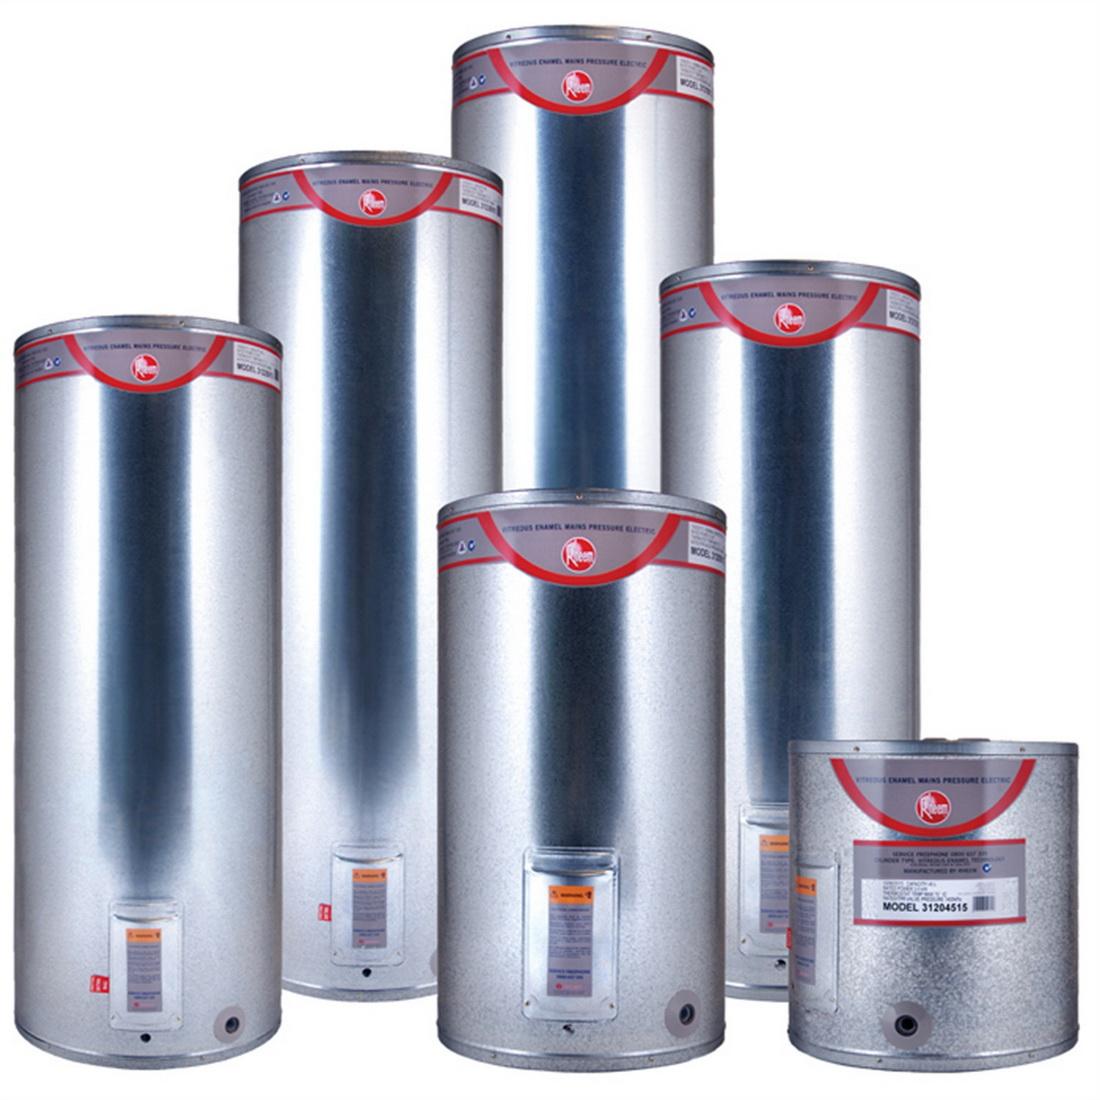 Rheem Mains Pressure Electric Hot Water Cylinder 180L 580 x 1166mm 3kW Vitreous Enamel 32218015